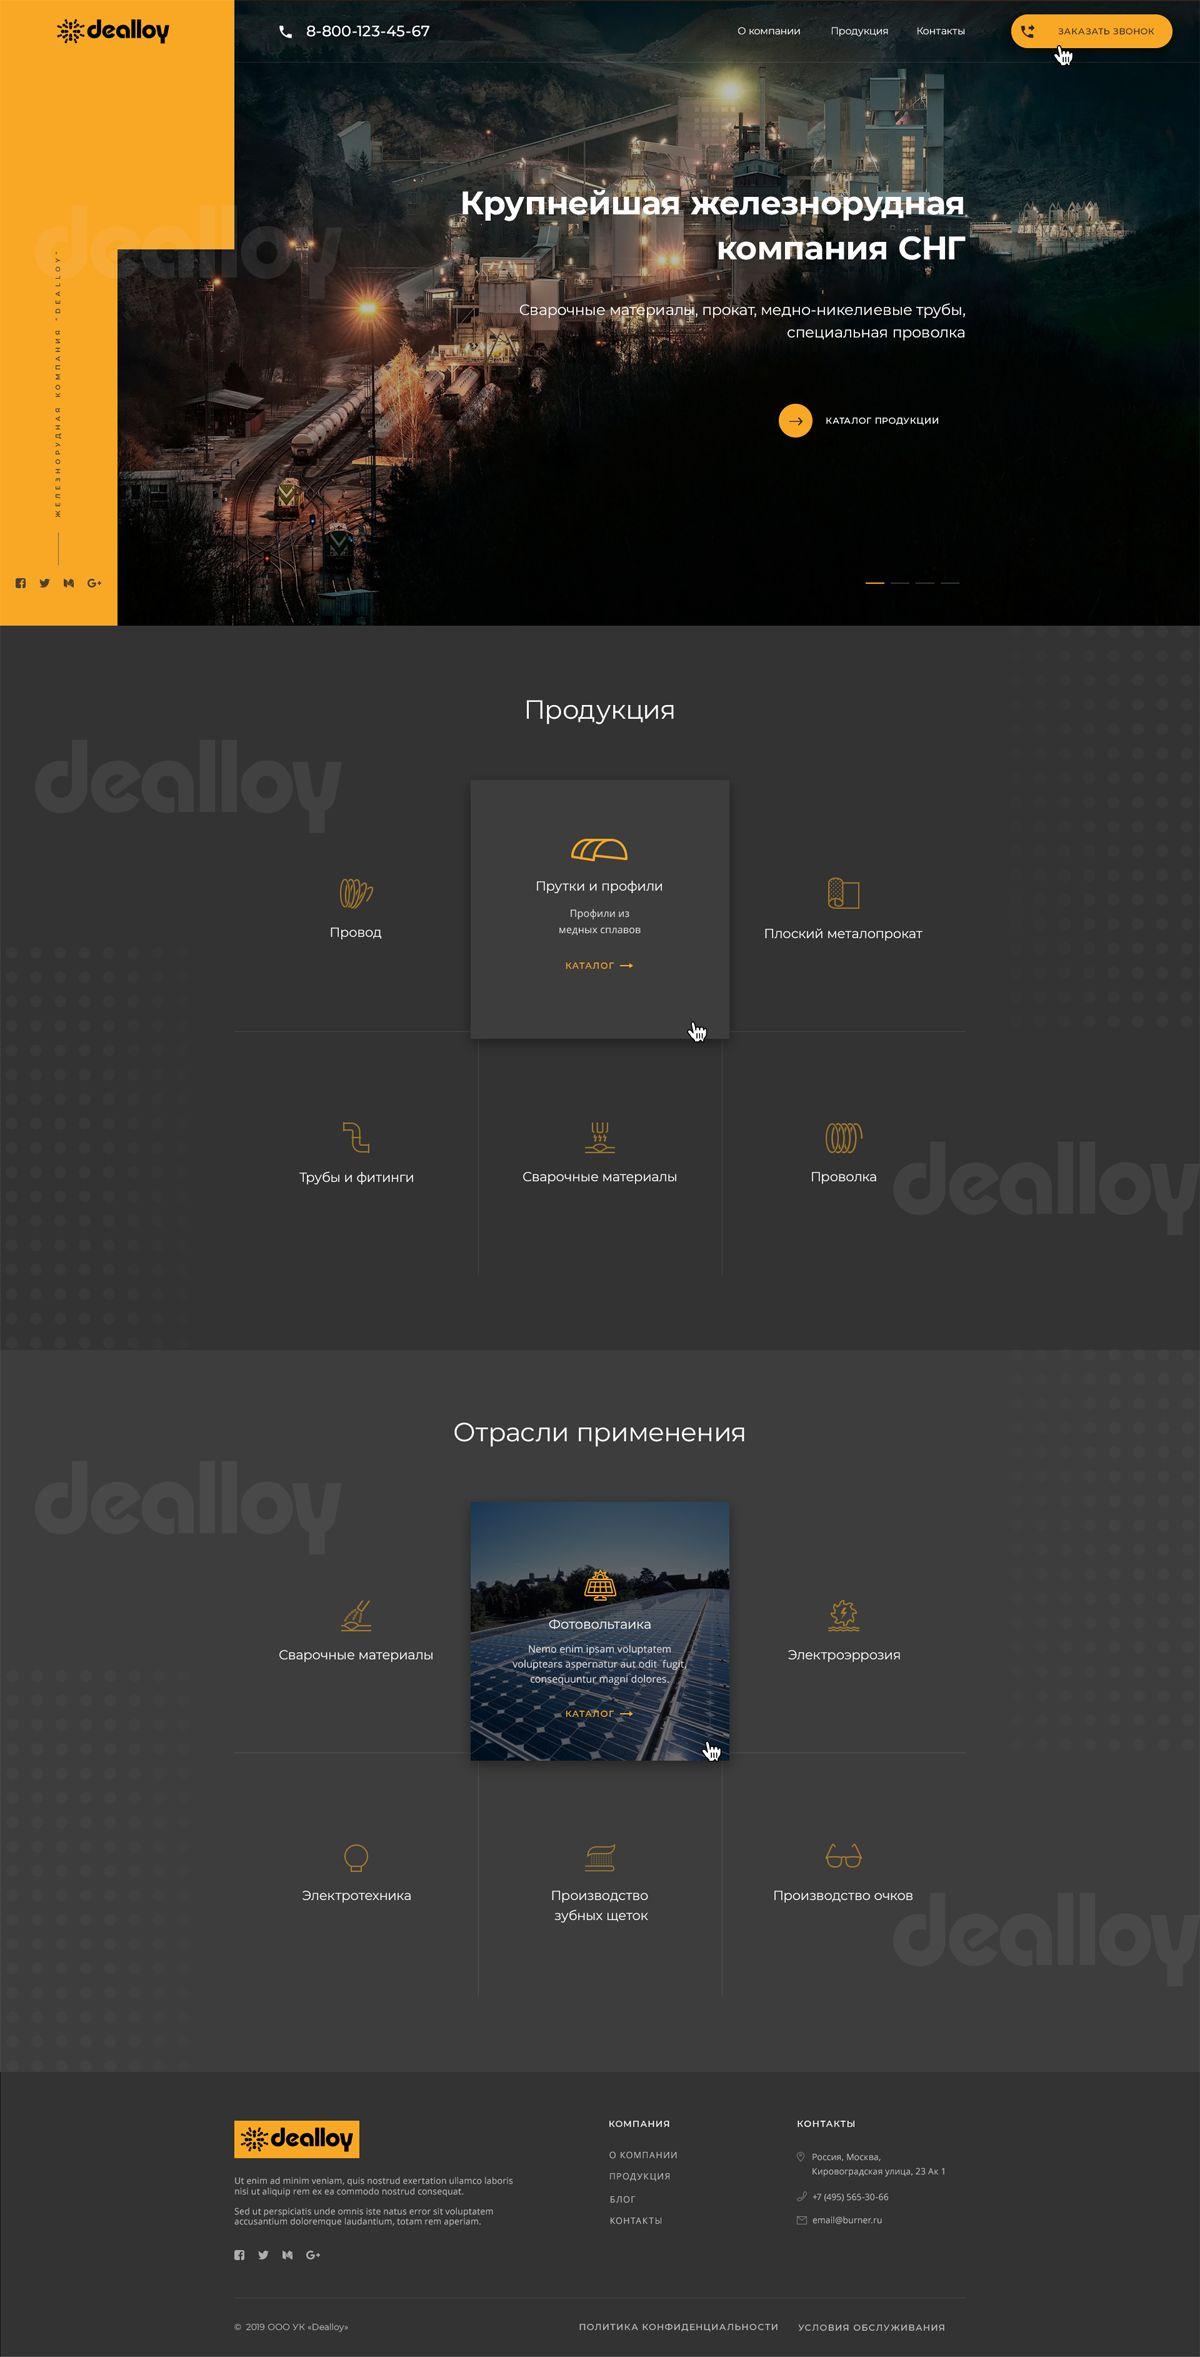 Веб-сайт для Dealloy.ru - дизайнер reyburn